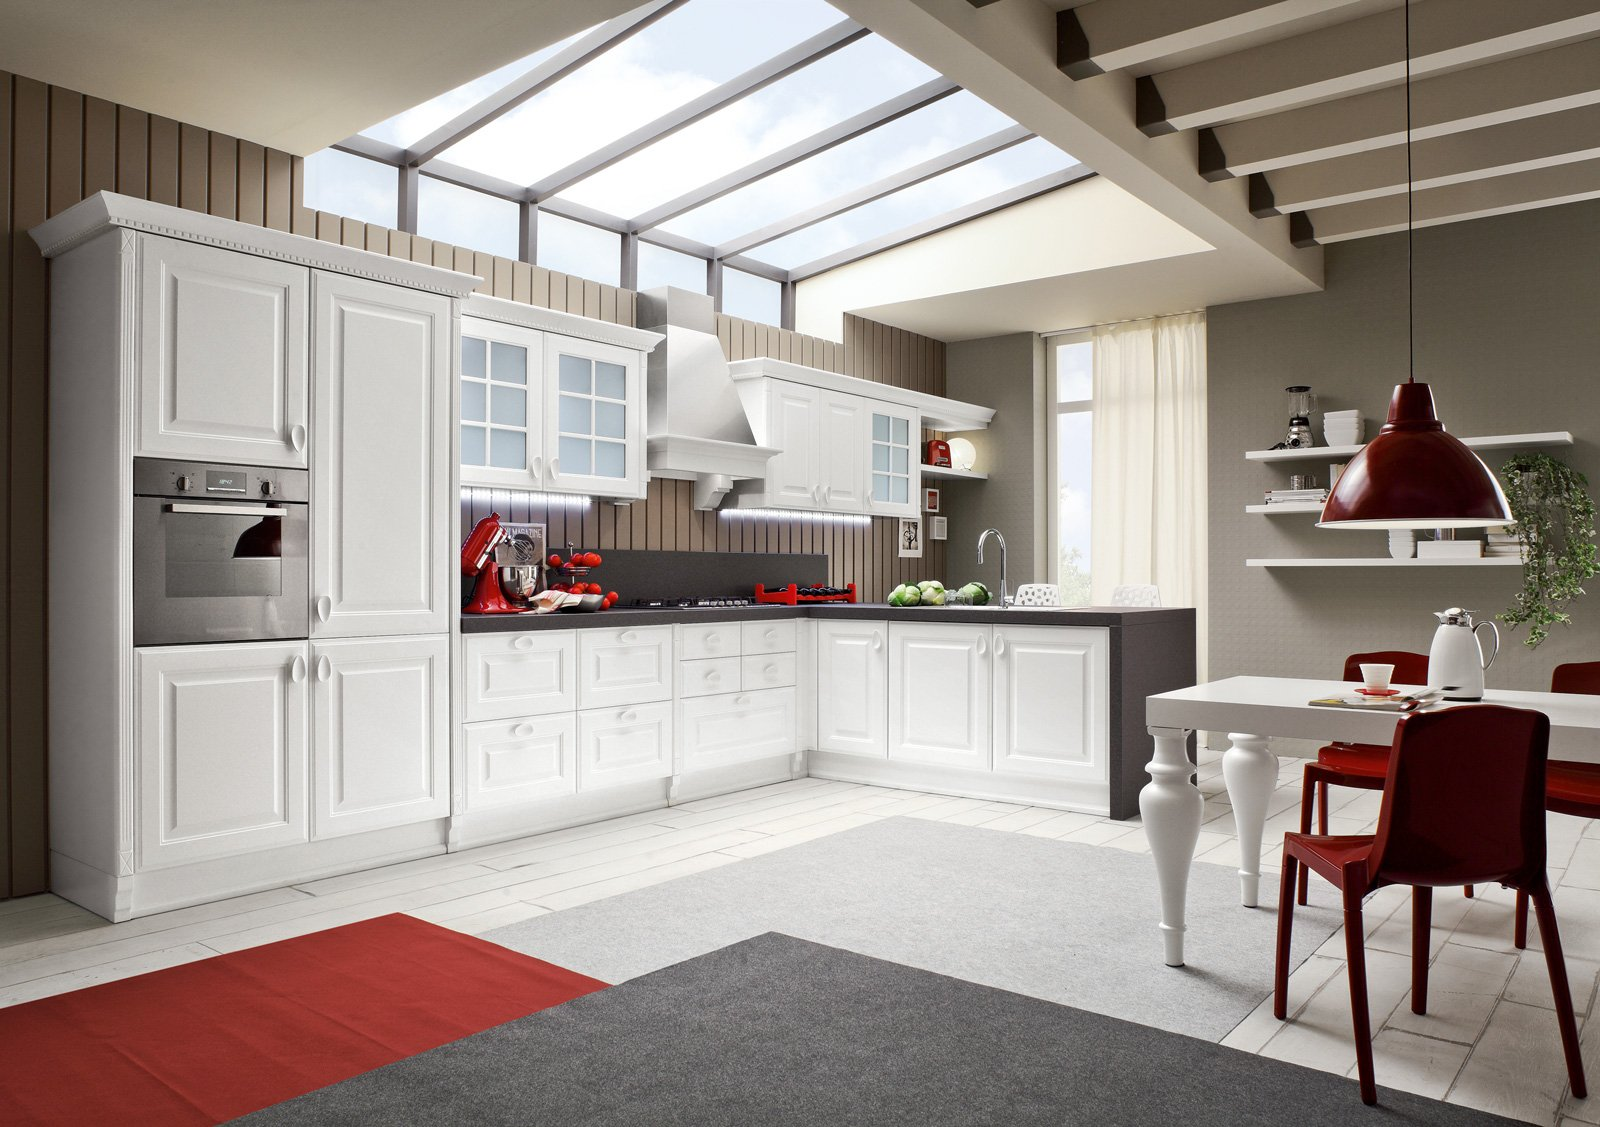 Awesome Arrex Cucine Classiche Images - Ideas & Design 2017 ...